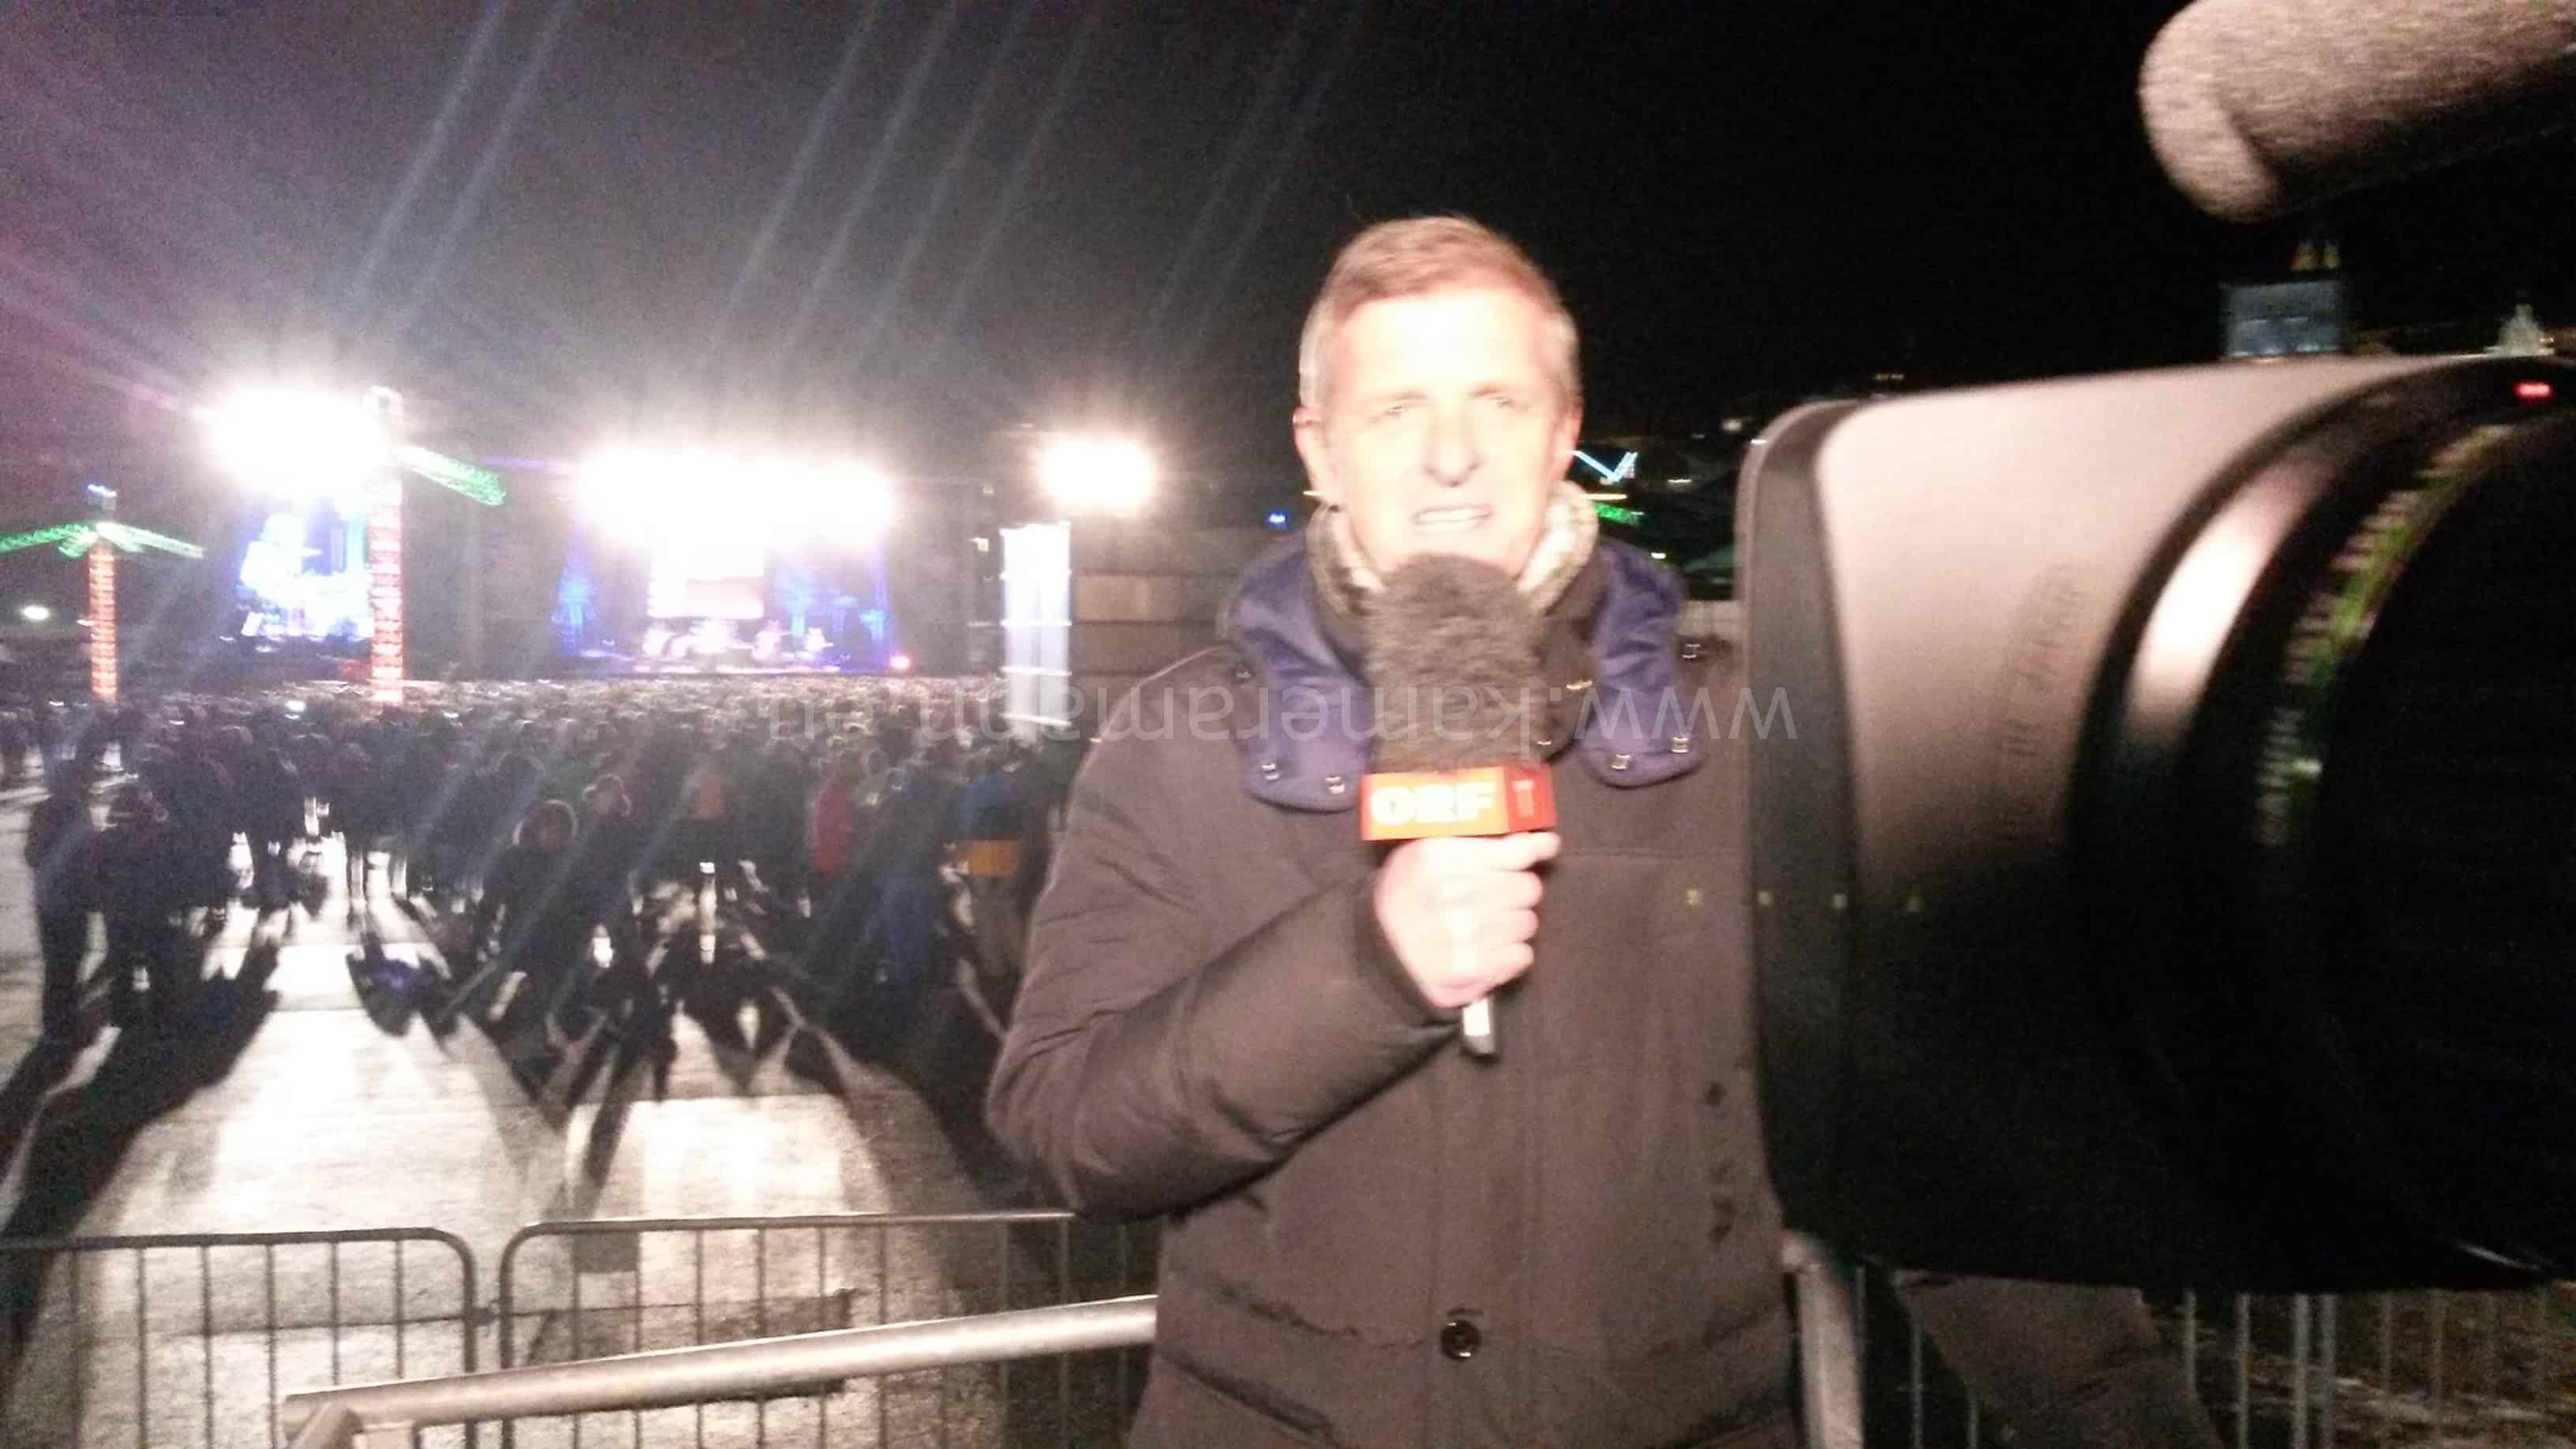 orf live - ORF Live aus Ischgl